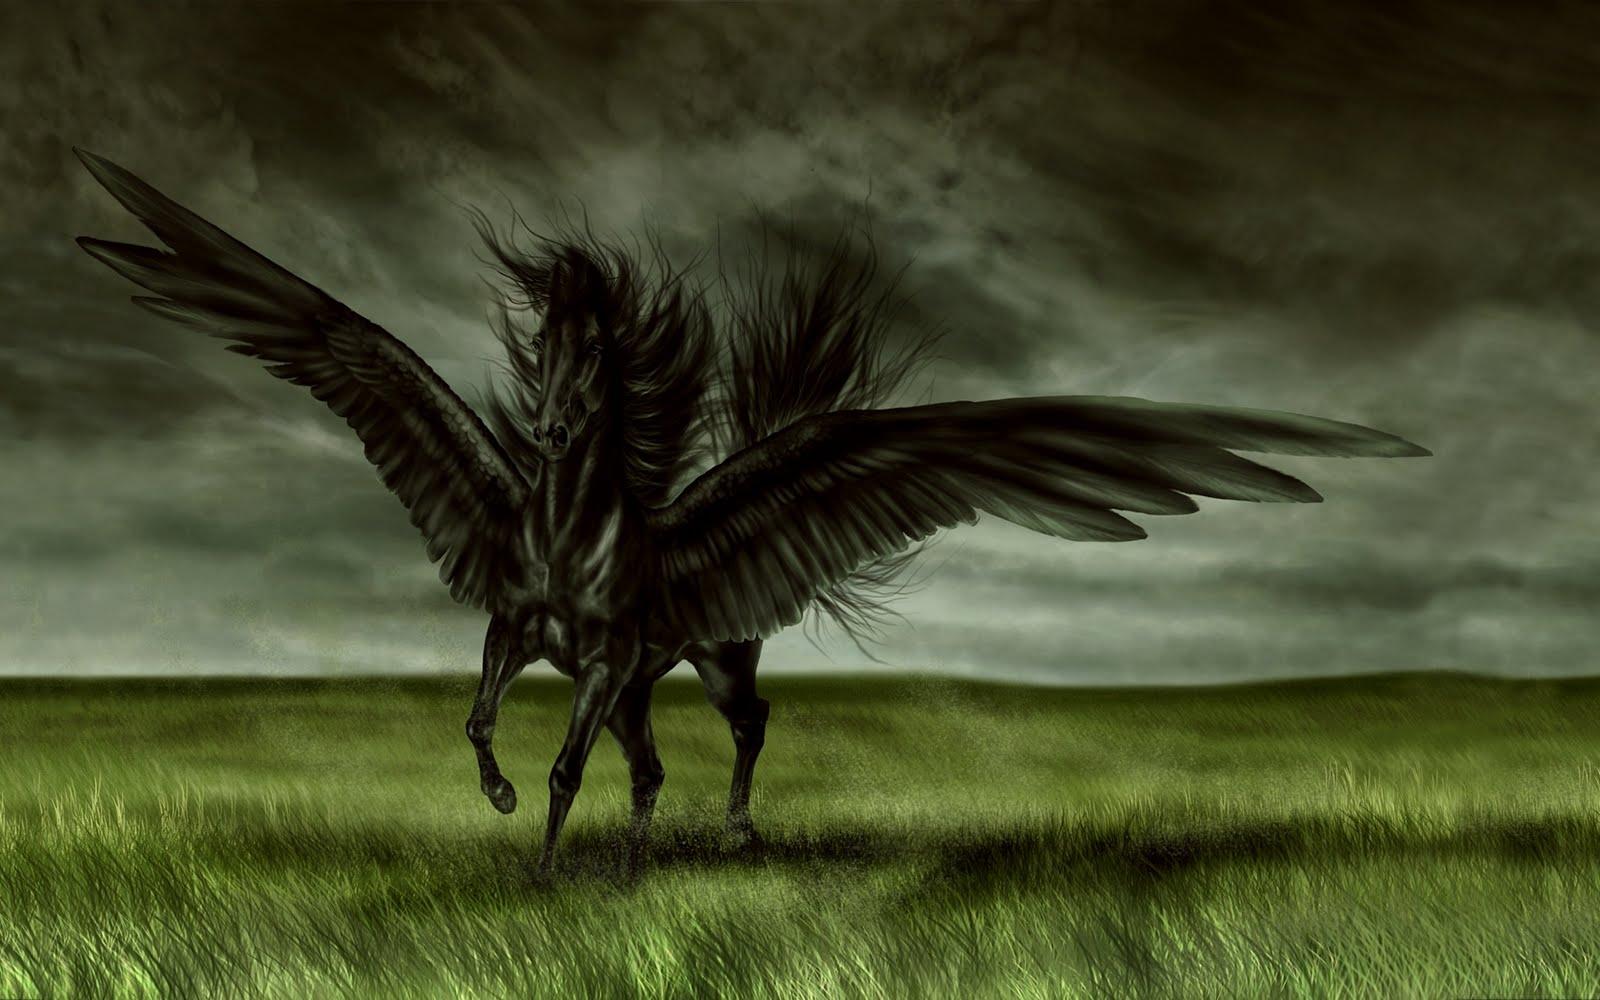 Amazing   Wallpaper Horse Magic - dark_fantasy_wallpaper_magic_horse-1680x1050  Pictures_228511.jpg